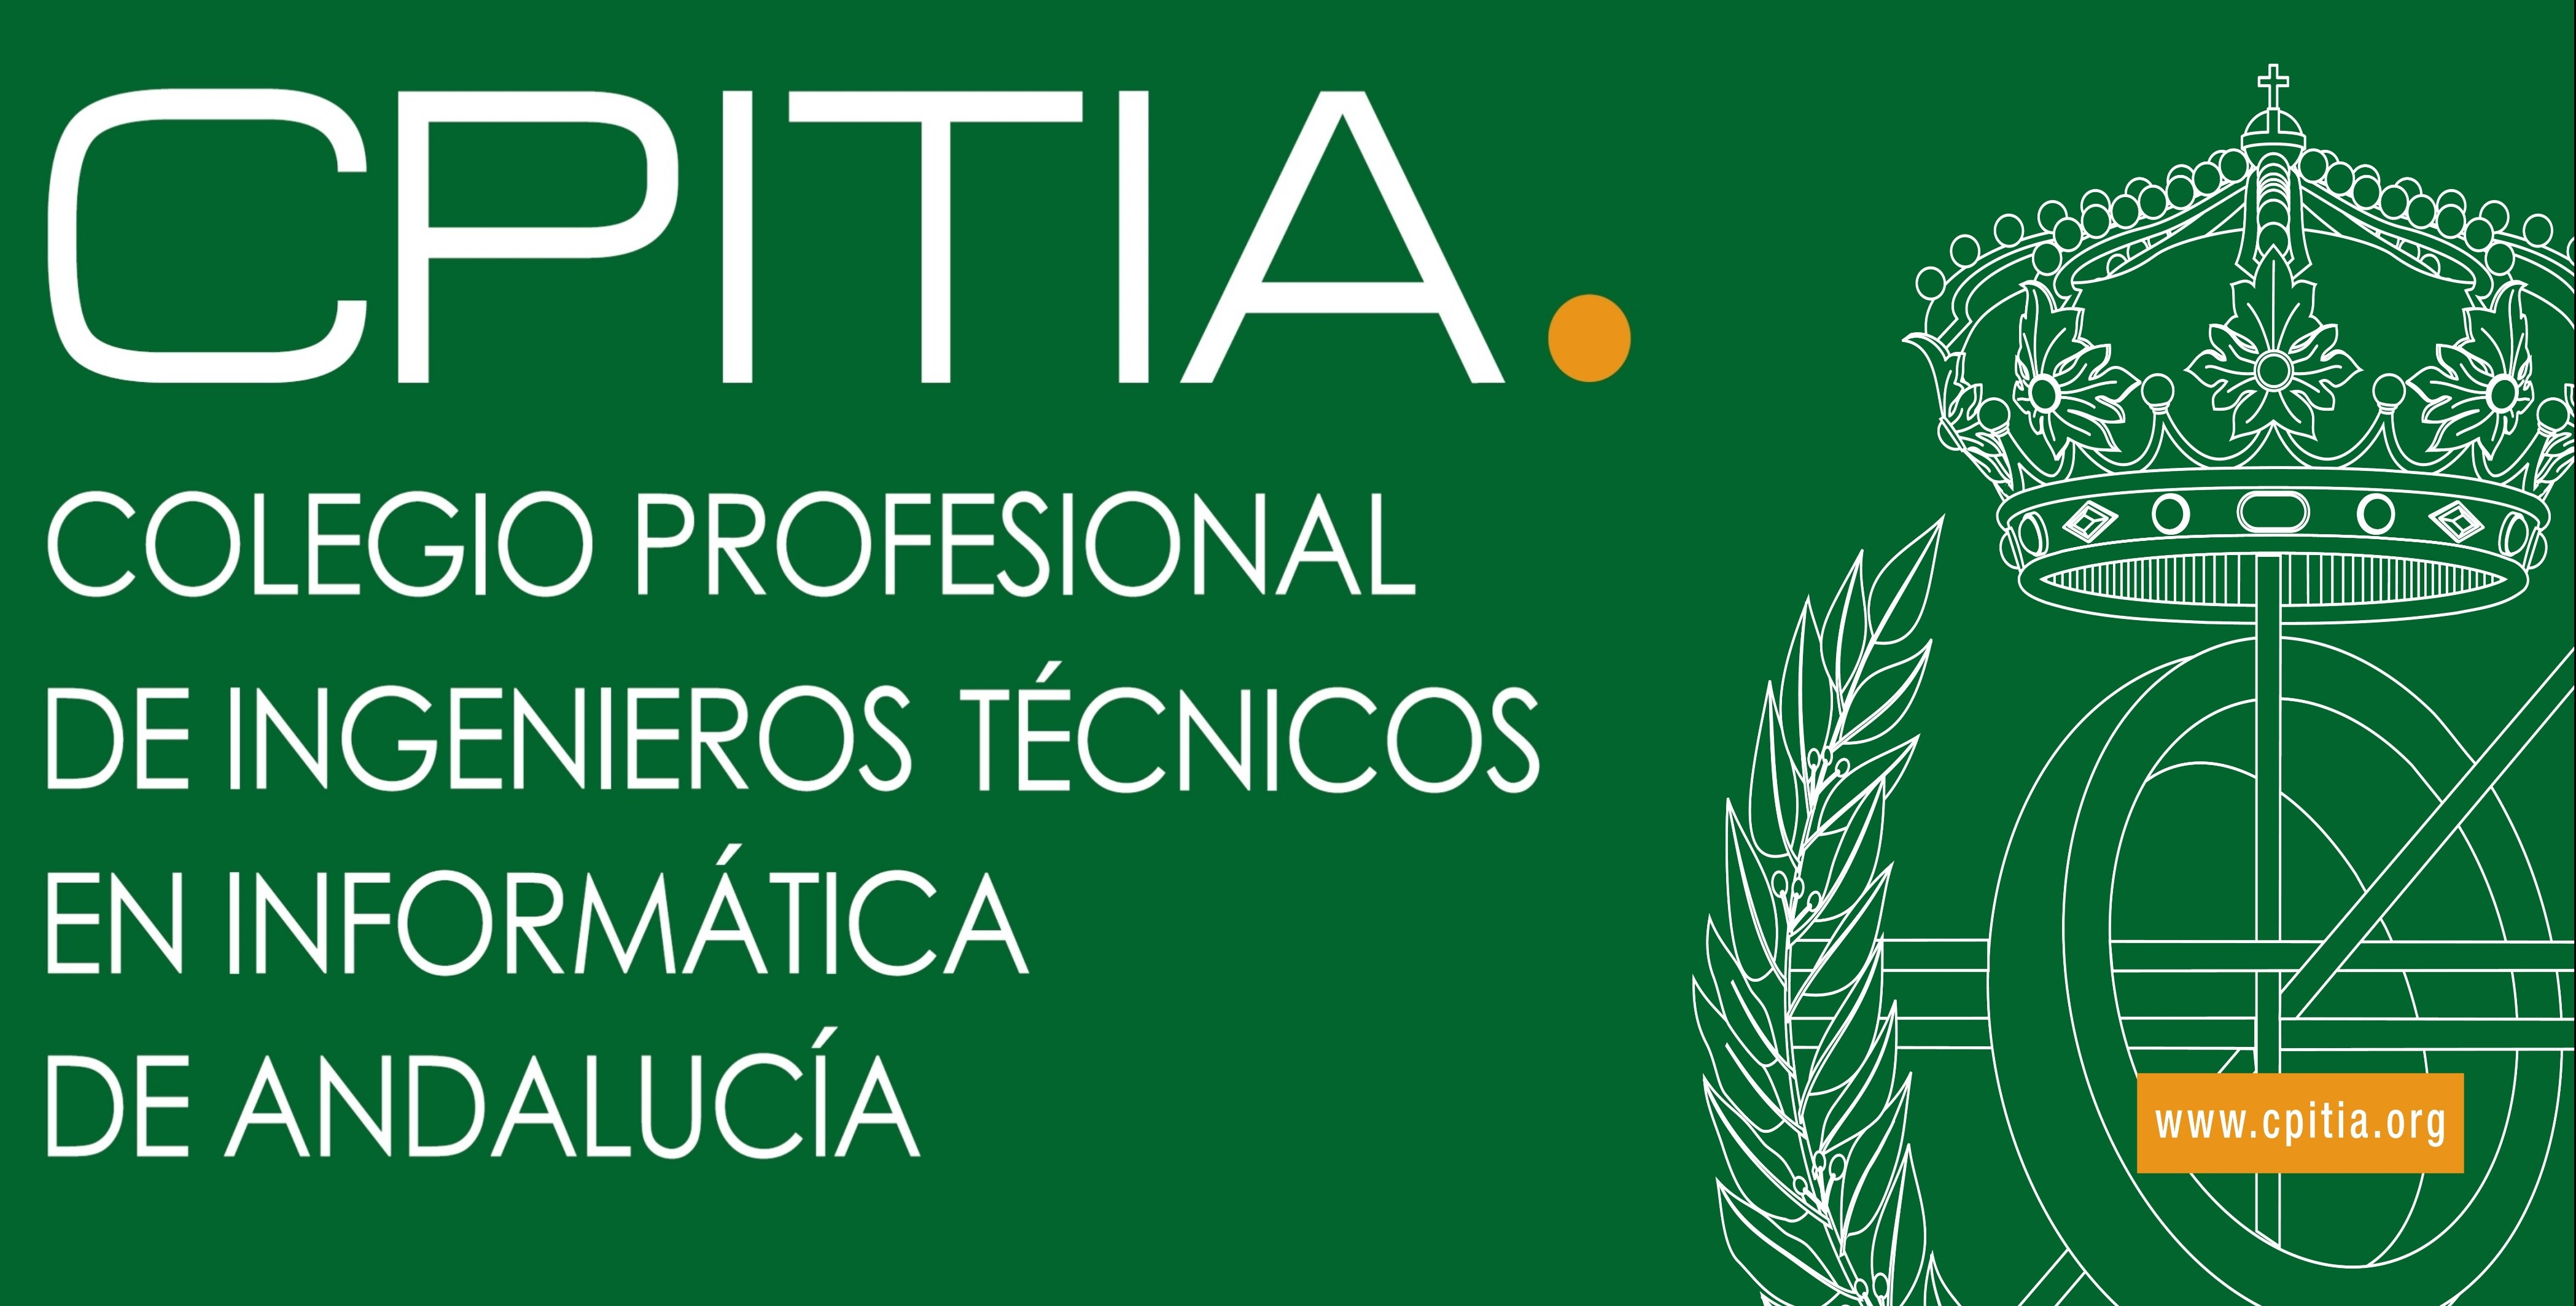 cropped-Logo-web-CPITIA.jpg